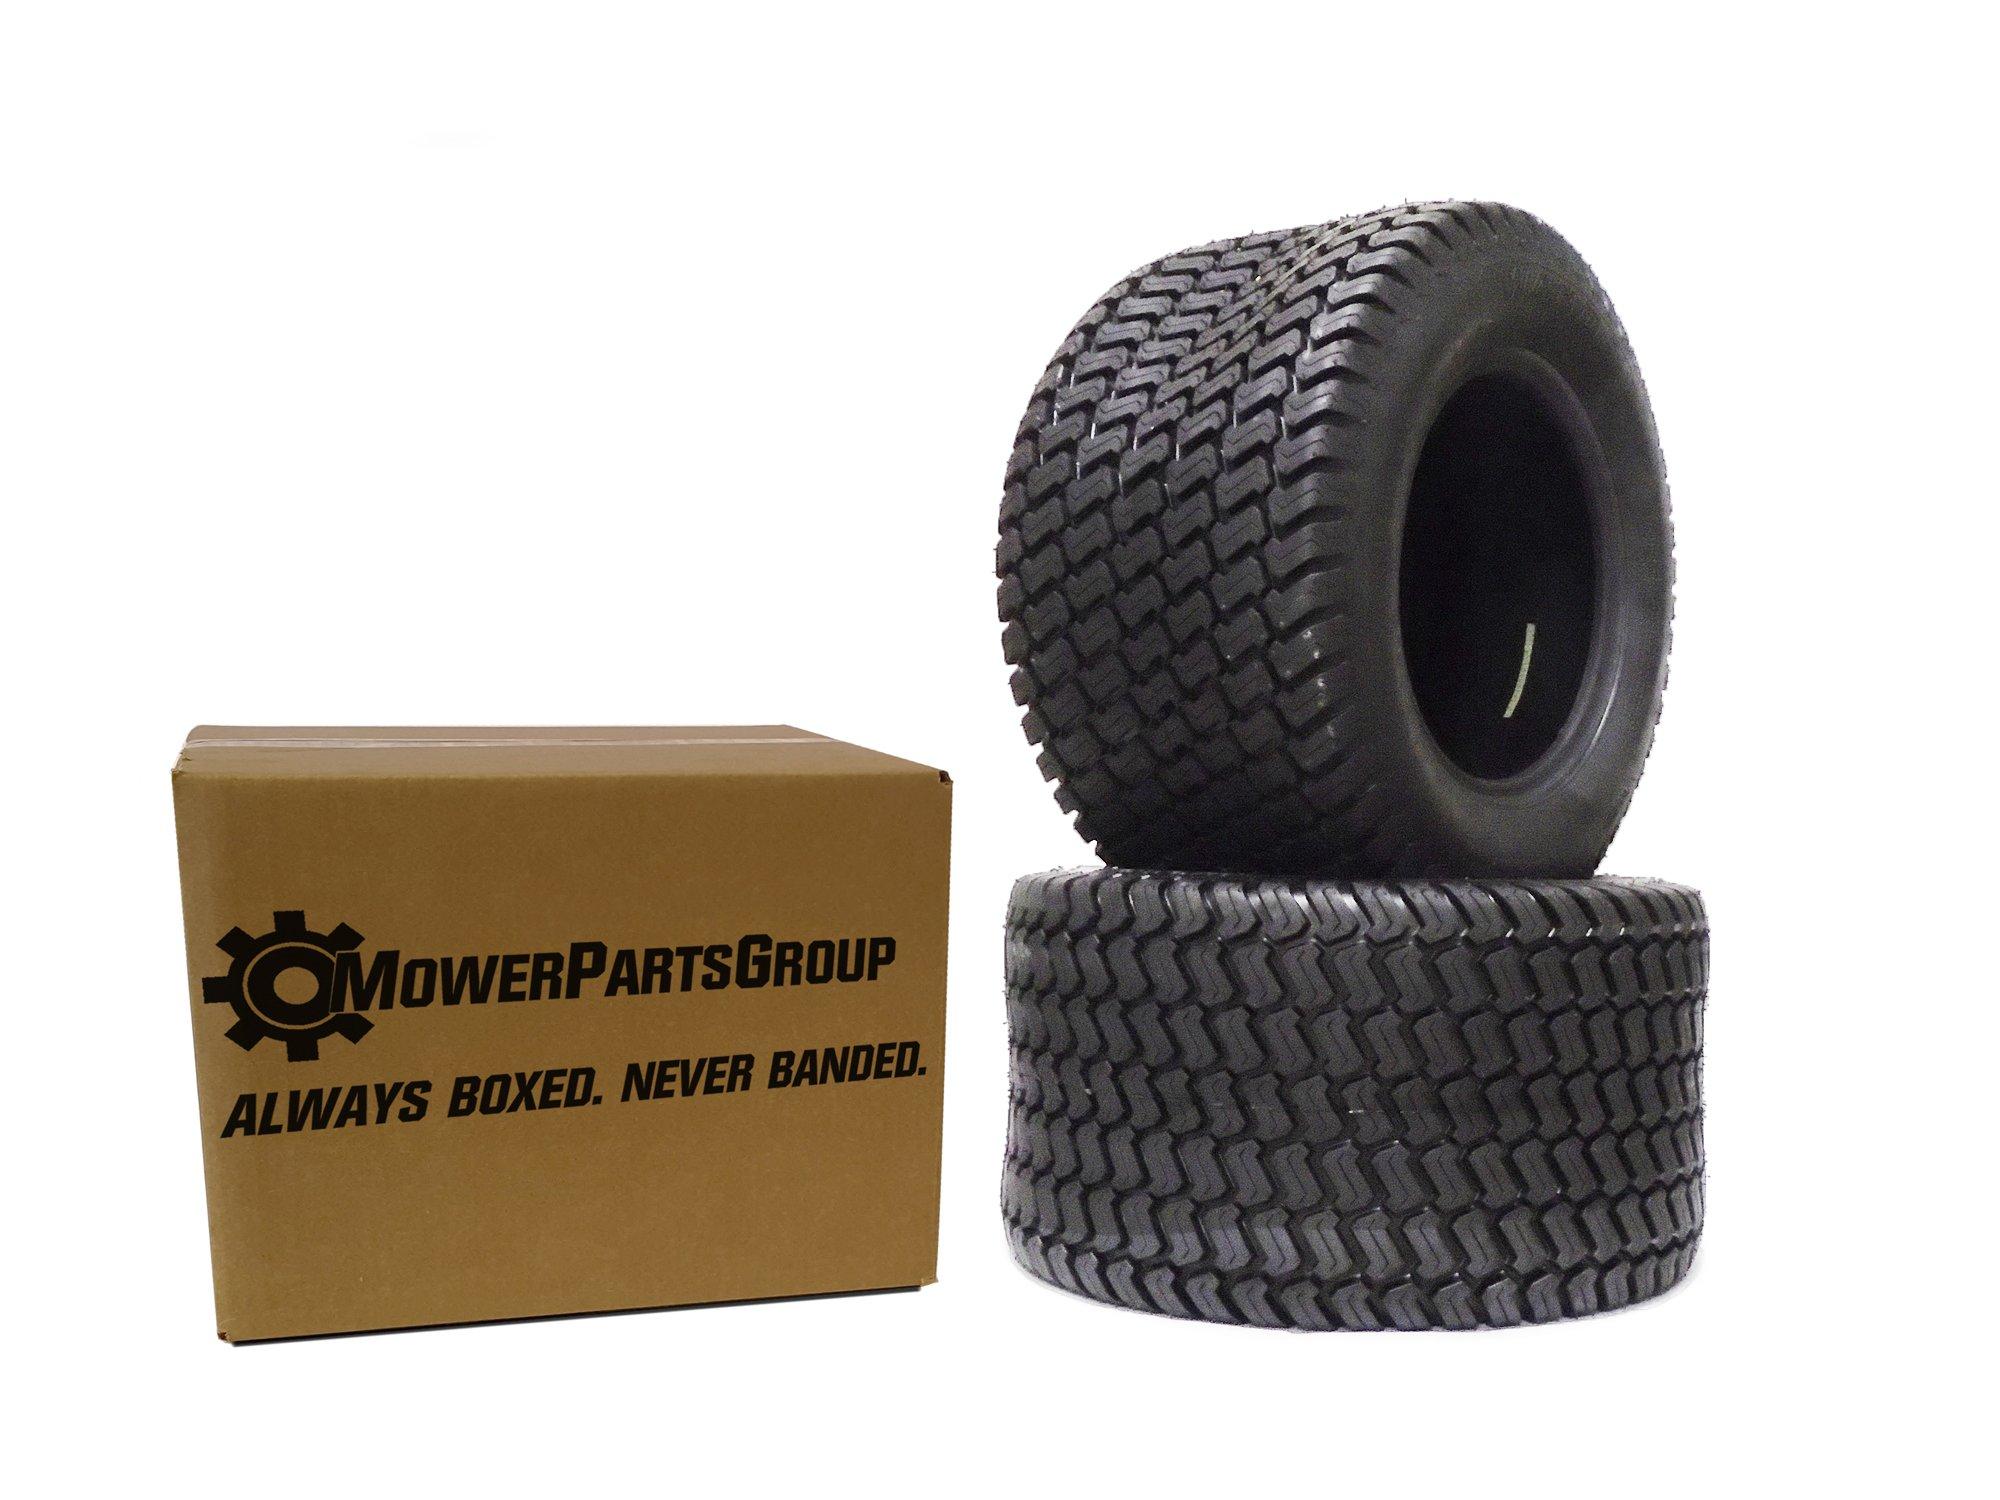 (2) 24x12.00-12 Wanda Tires 4 Ply Lawn Mower Garden Tractor 24x12-12 Turf Master Tread